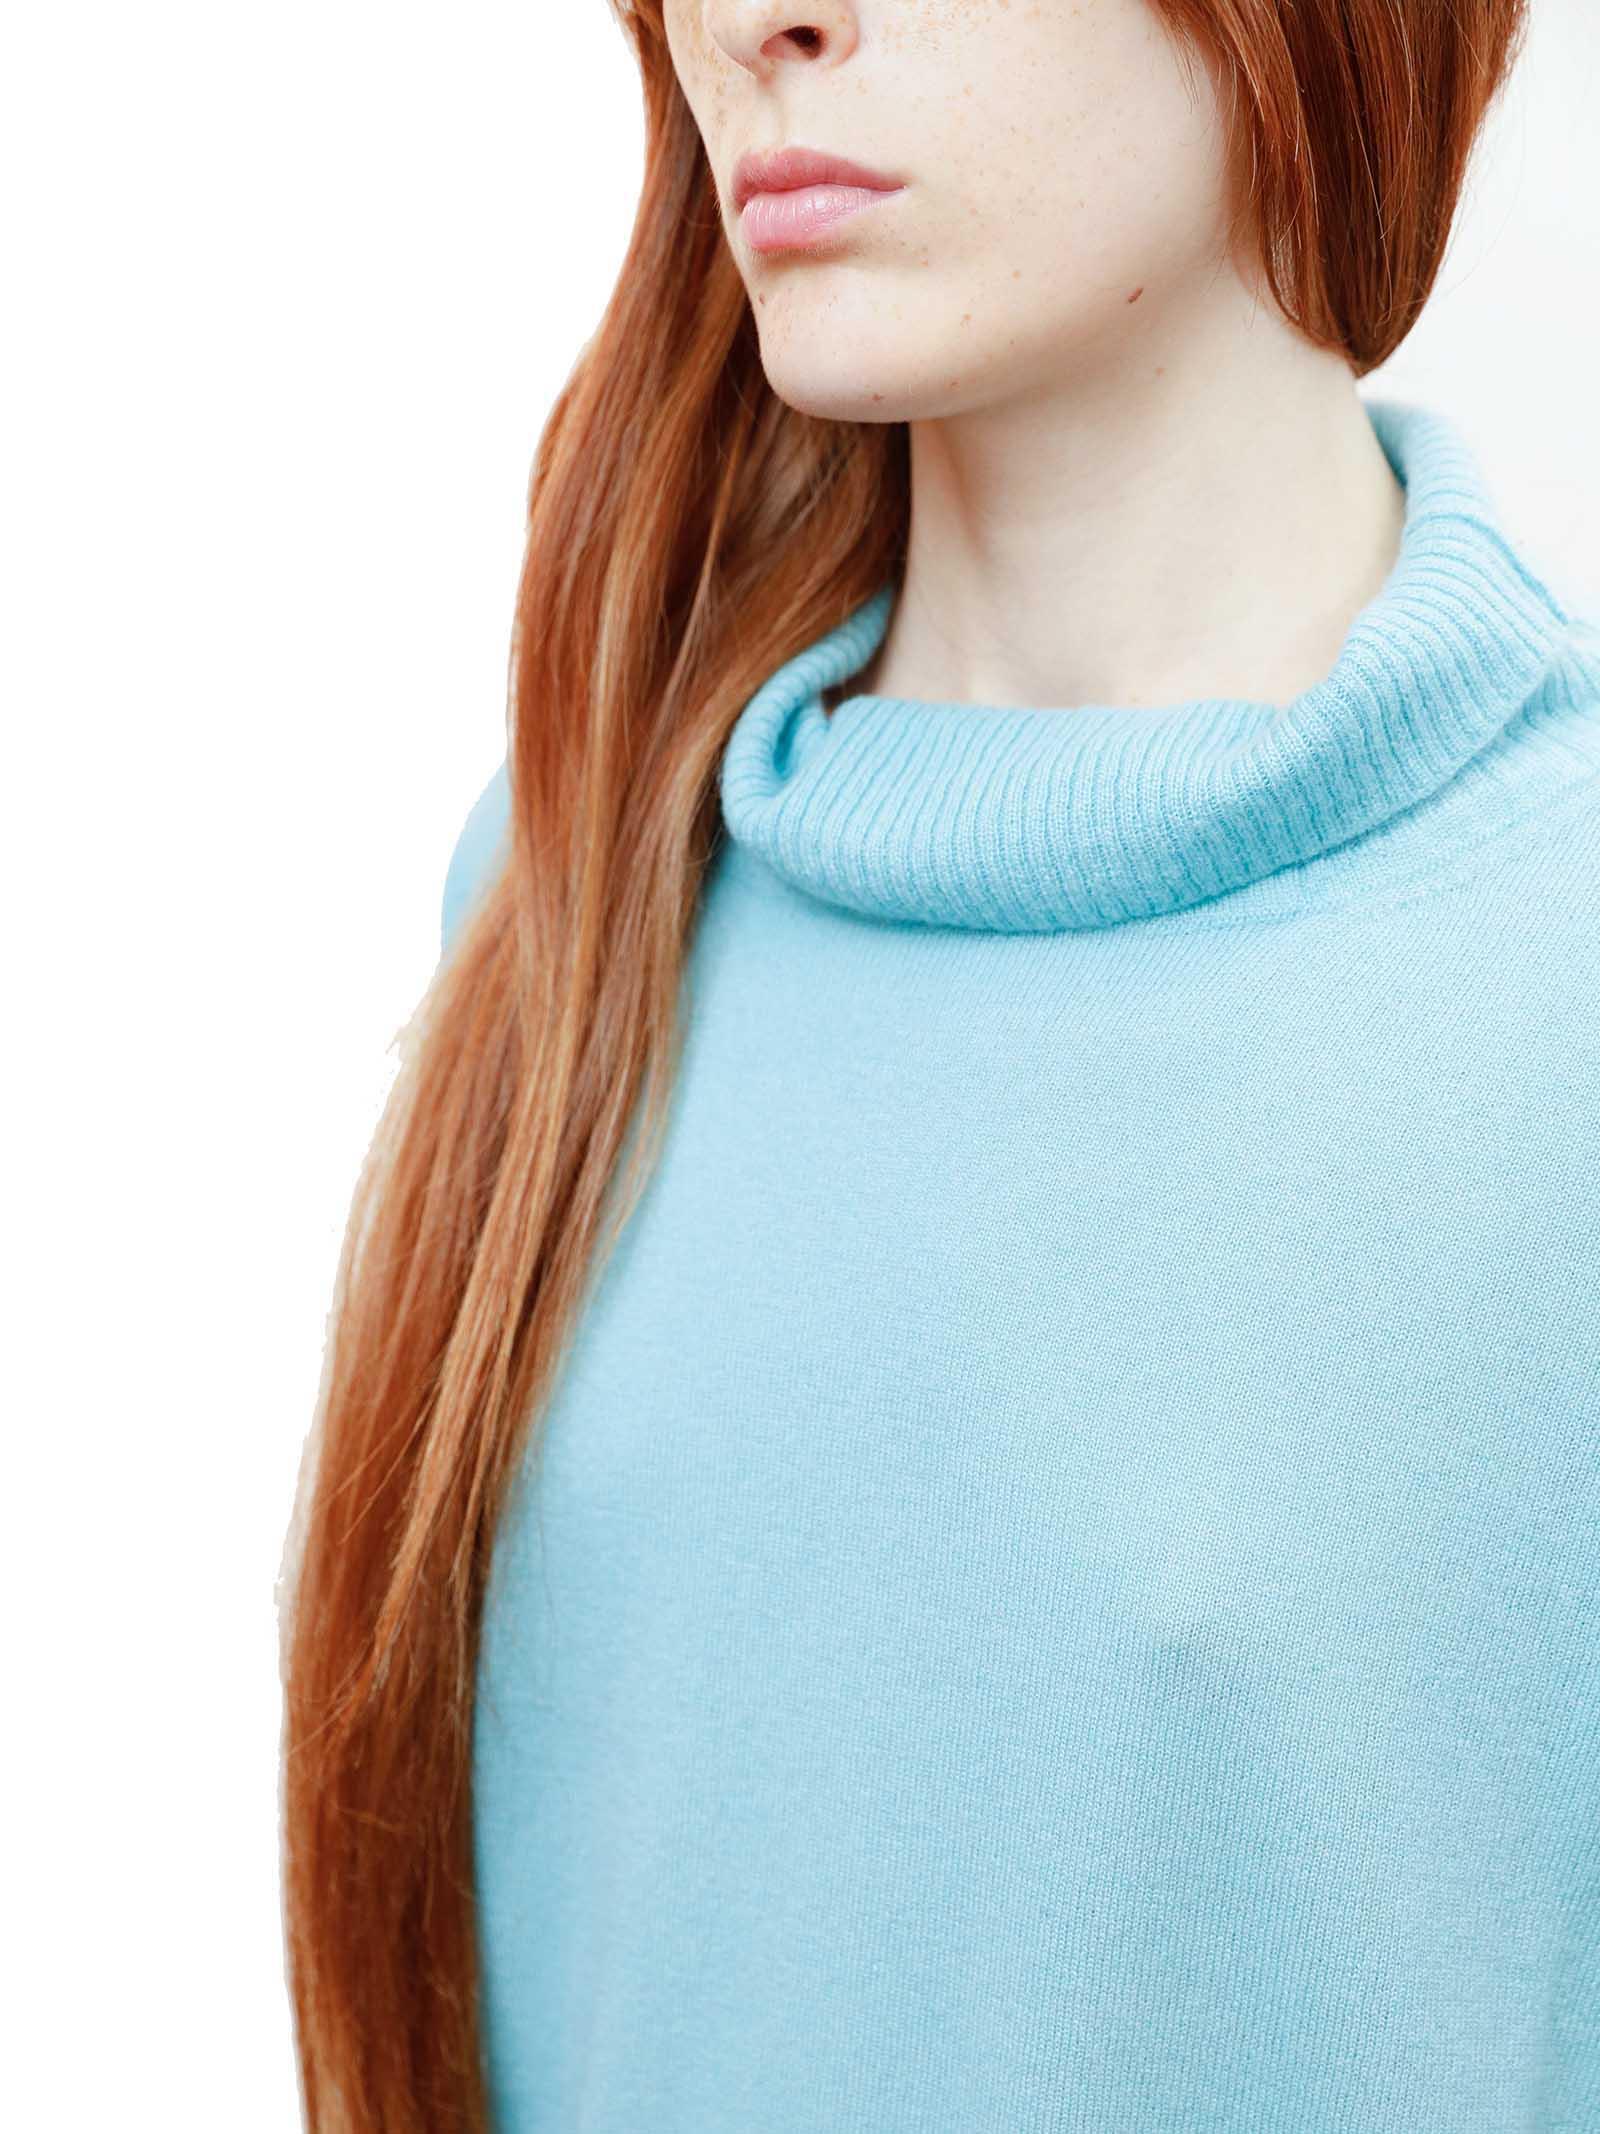 Women's Clothing Soft Cashmere Sweater in Aqua Green and Luerx Turtleneck Maliparmi | Knitwear | JQ49027052360012